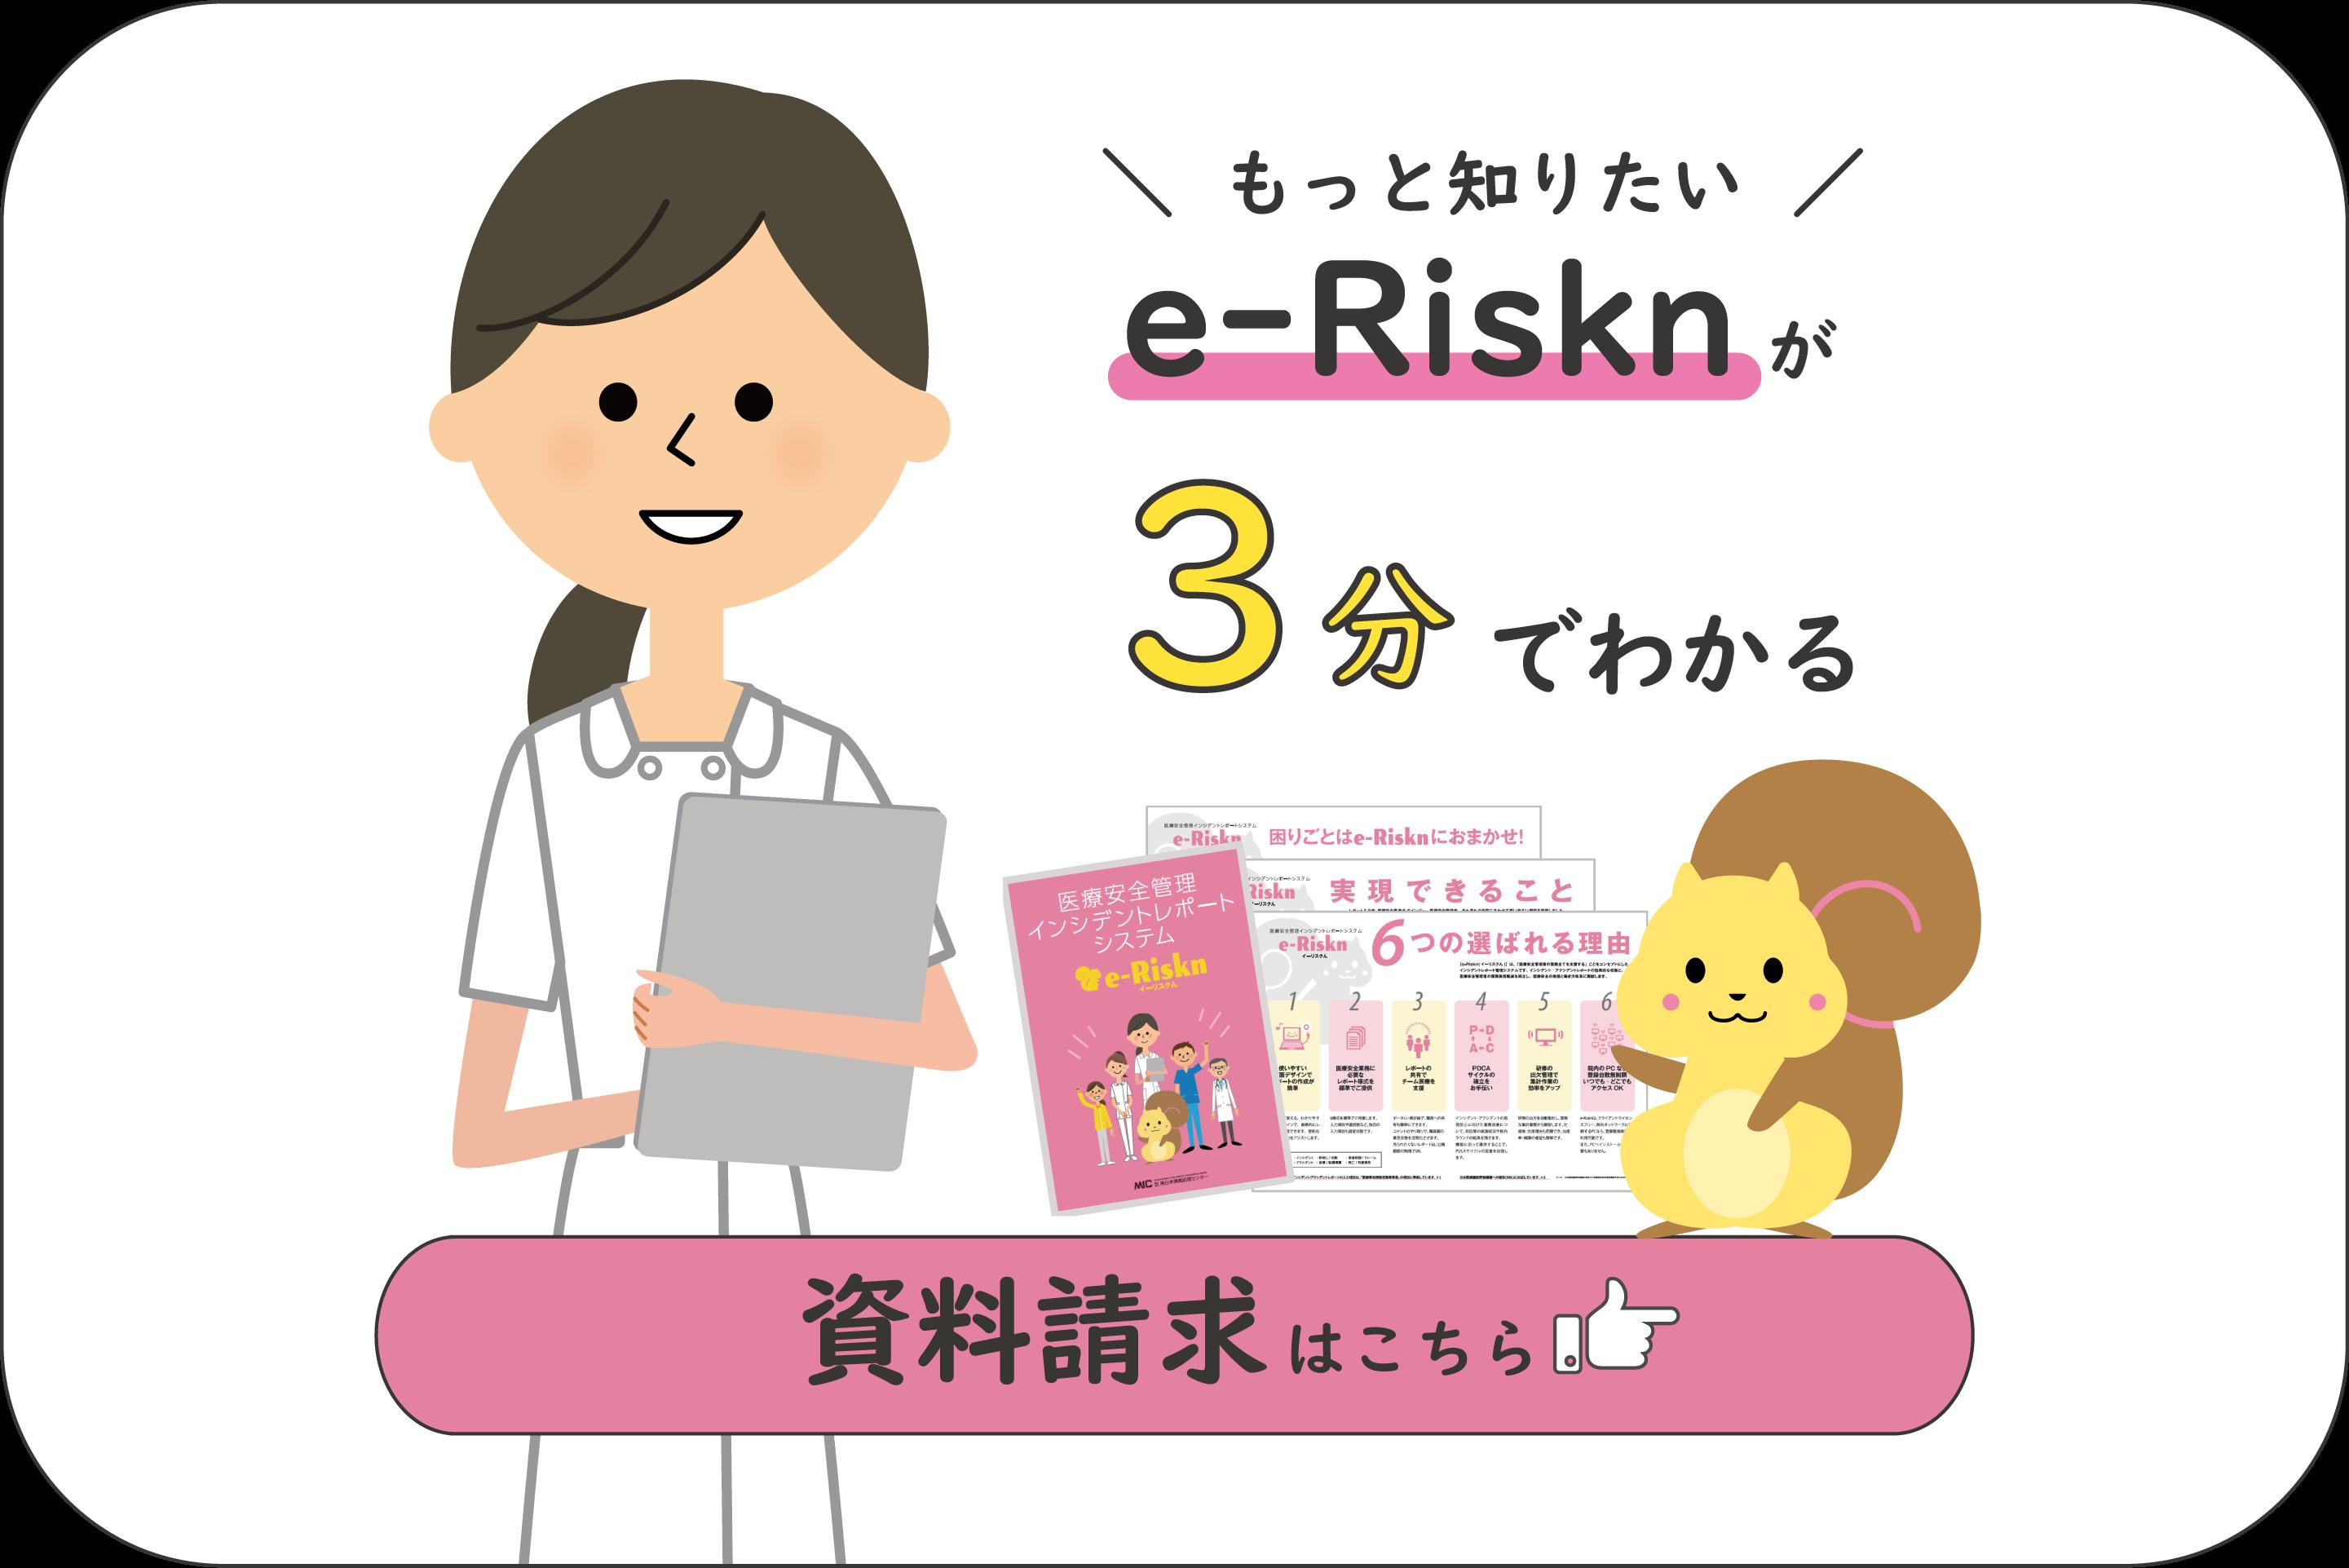 e-Risknが3分でわかる資料ダウンロード